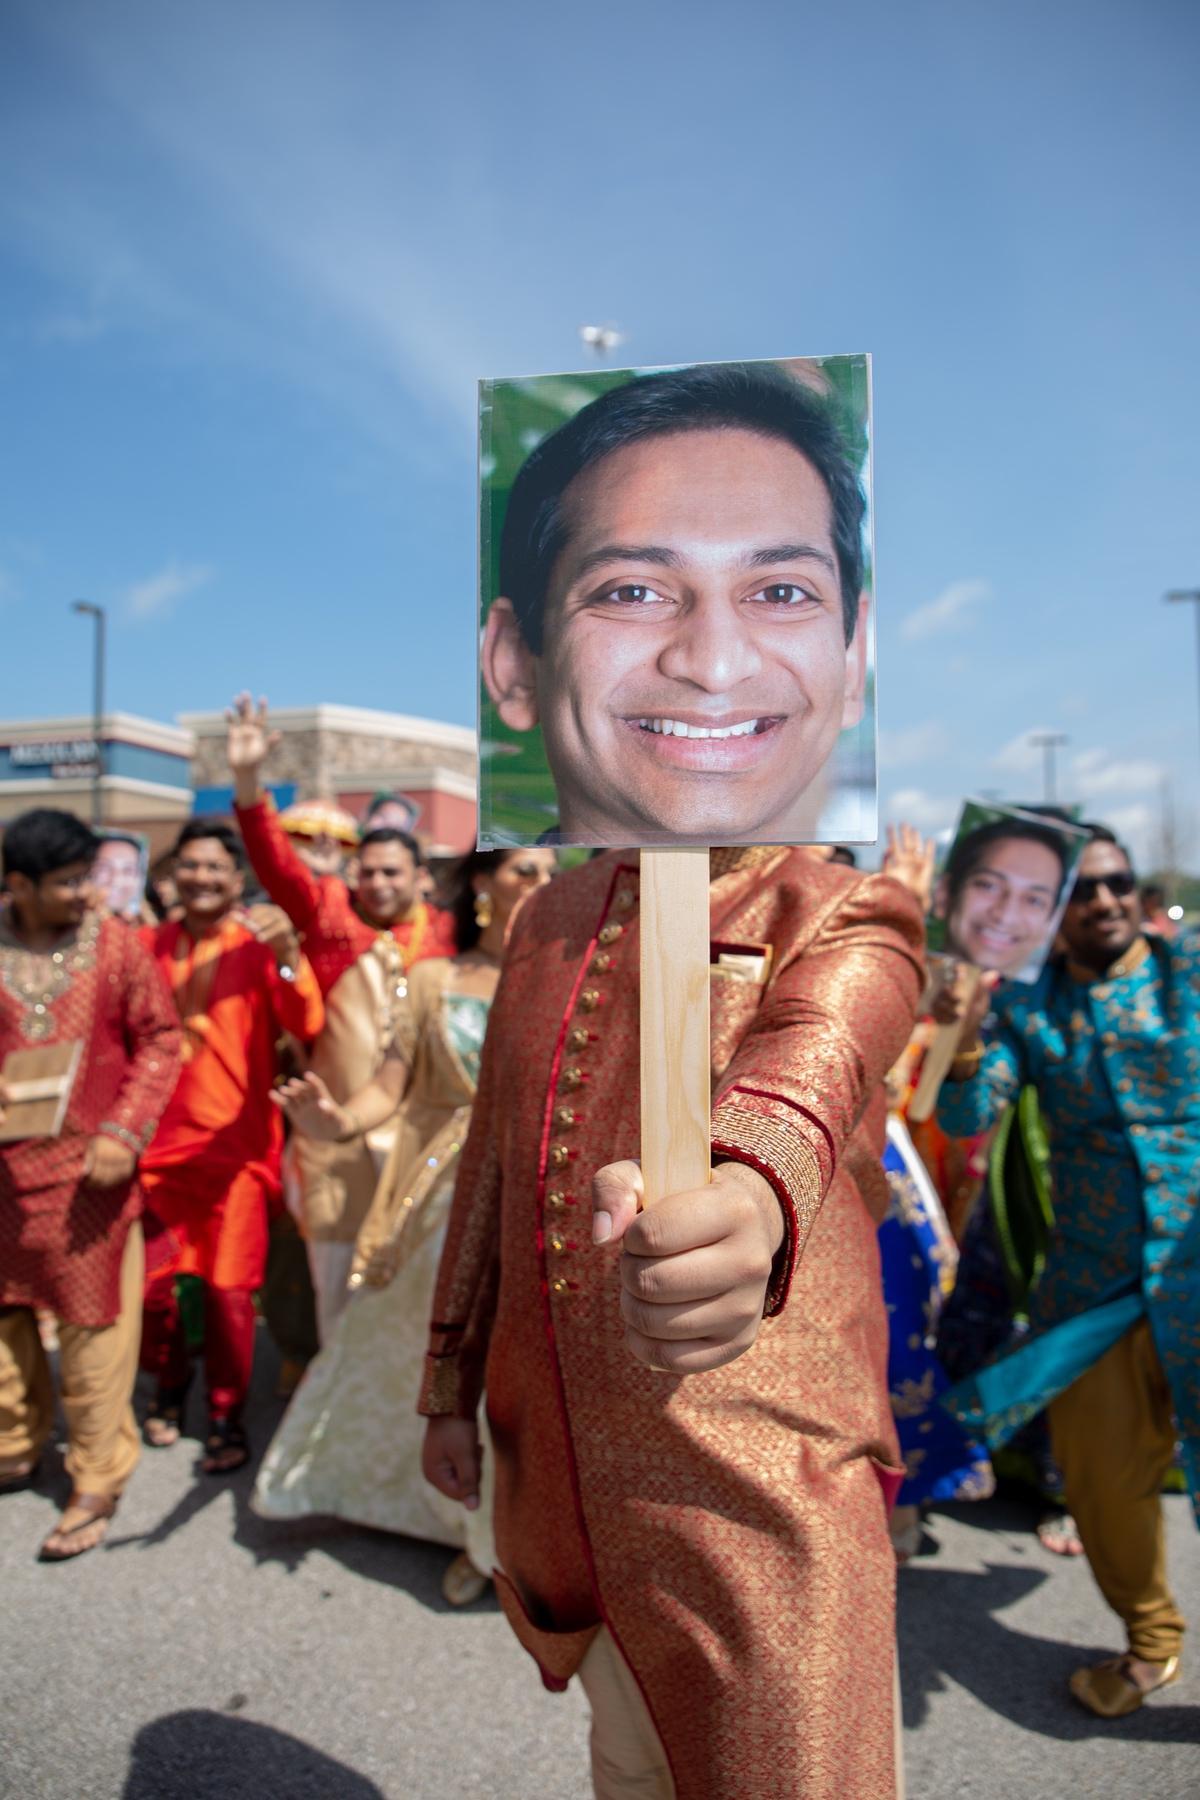 Le Cape Weddings - South Asian Wedding - Chicago Wedding Photographer P&V-52.jpg